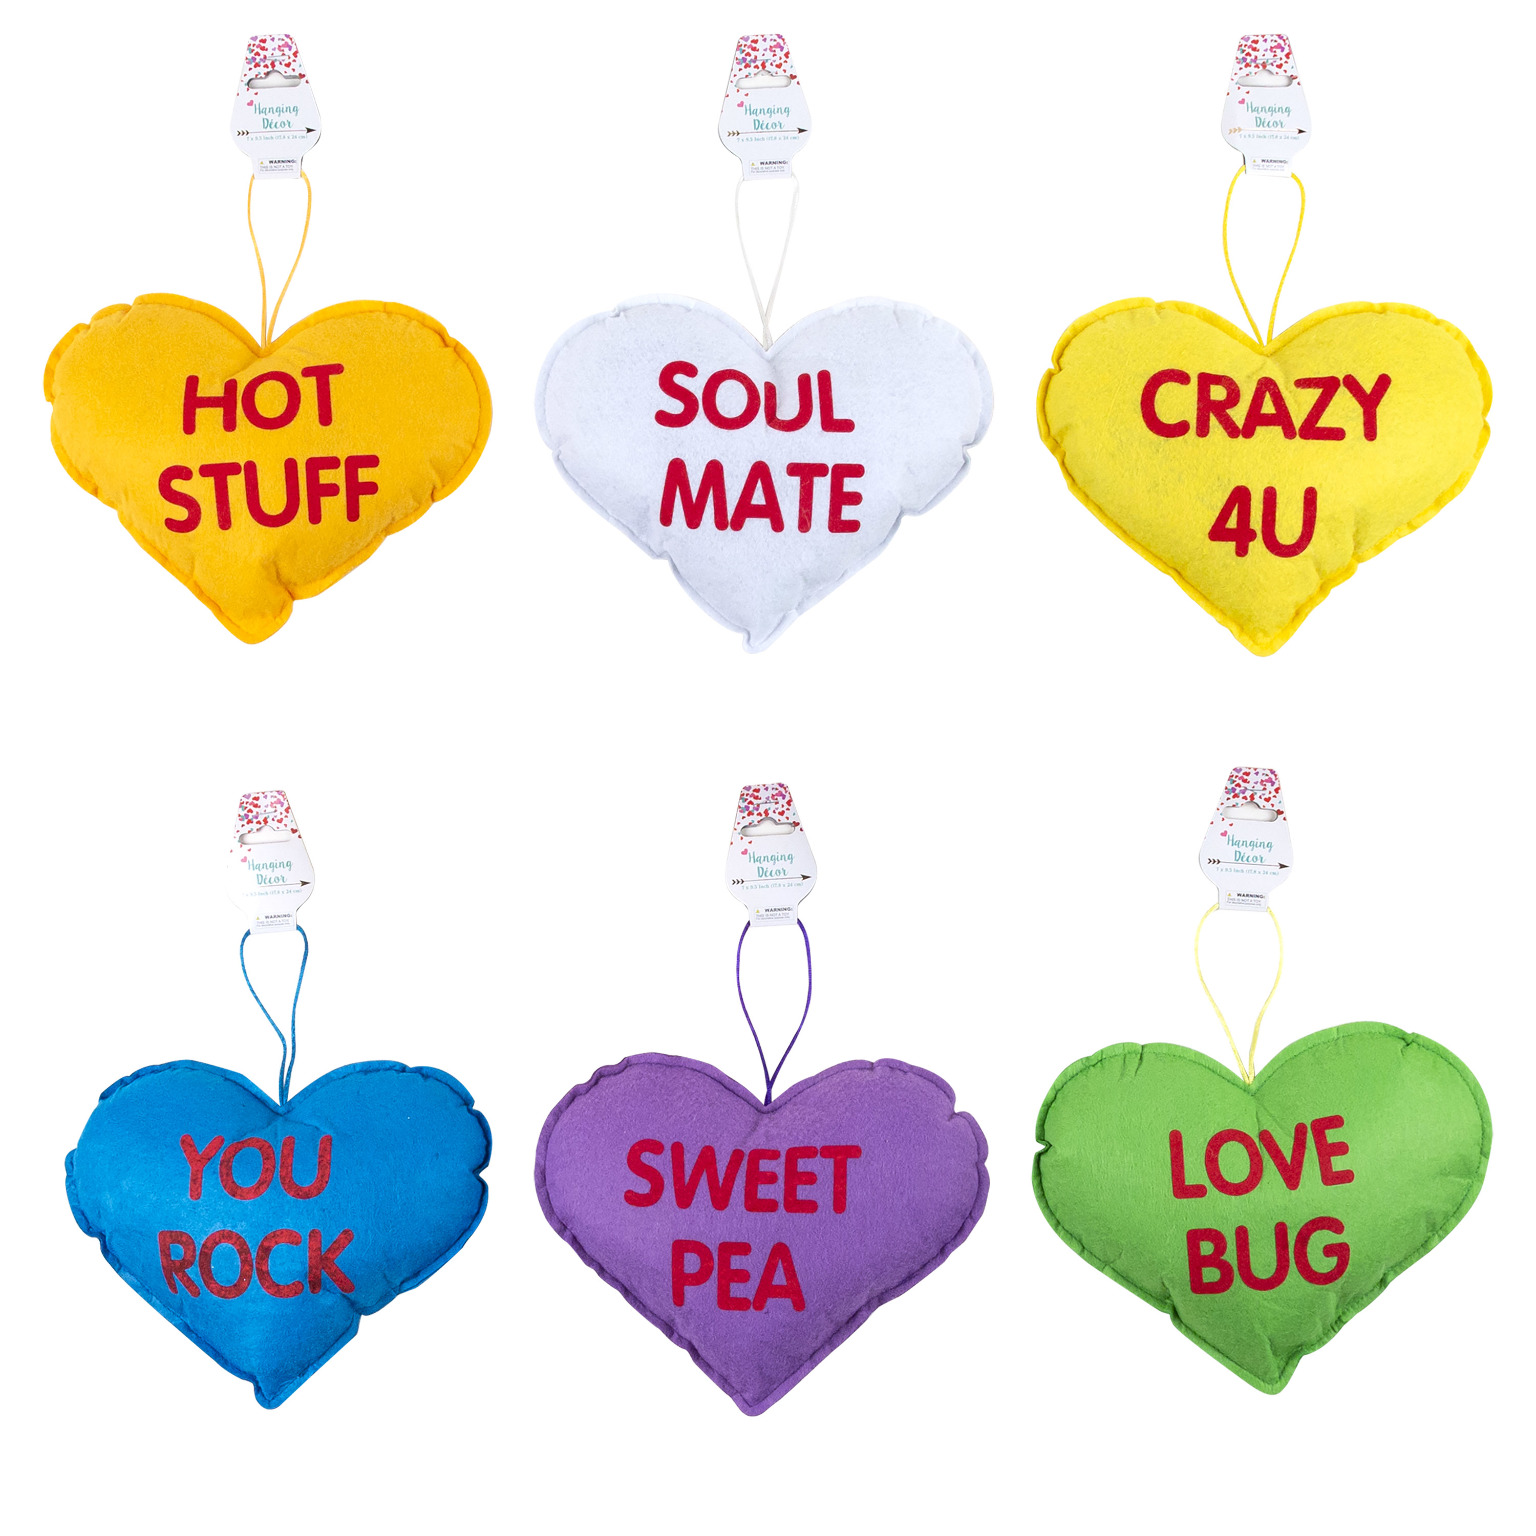 wholesale conversation heart pillow 7 x 9 assorted colors sku 2343318 dollardays